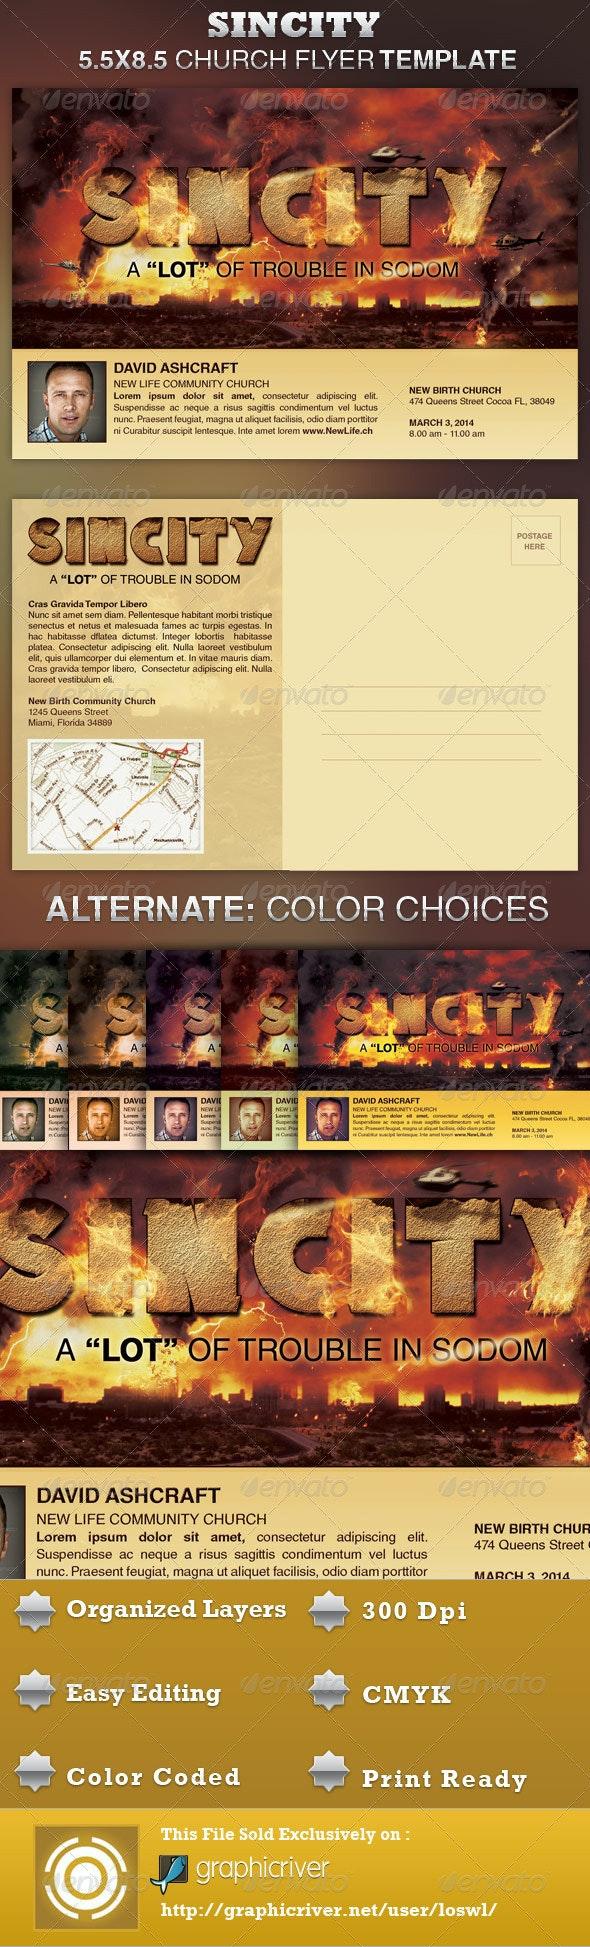 SinCity Church Flyer Template - Church Flyers